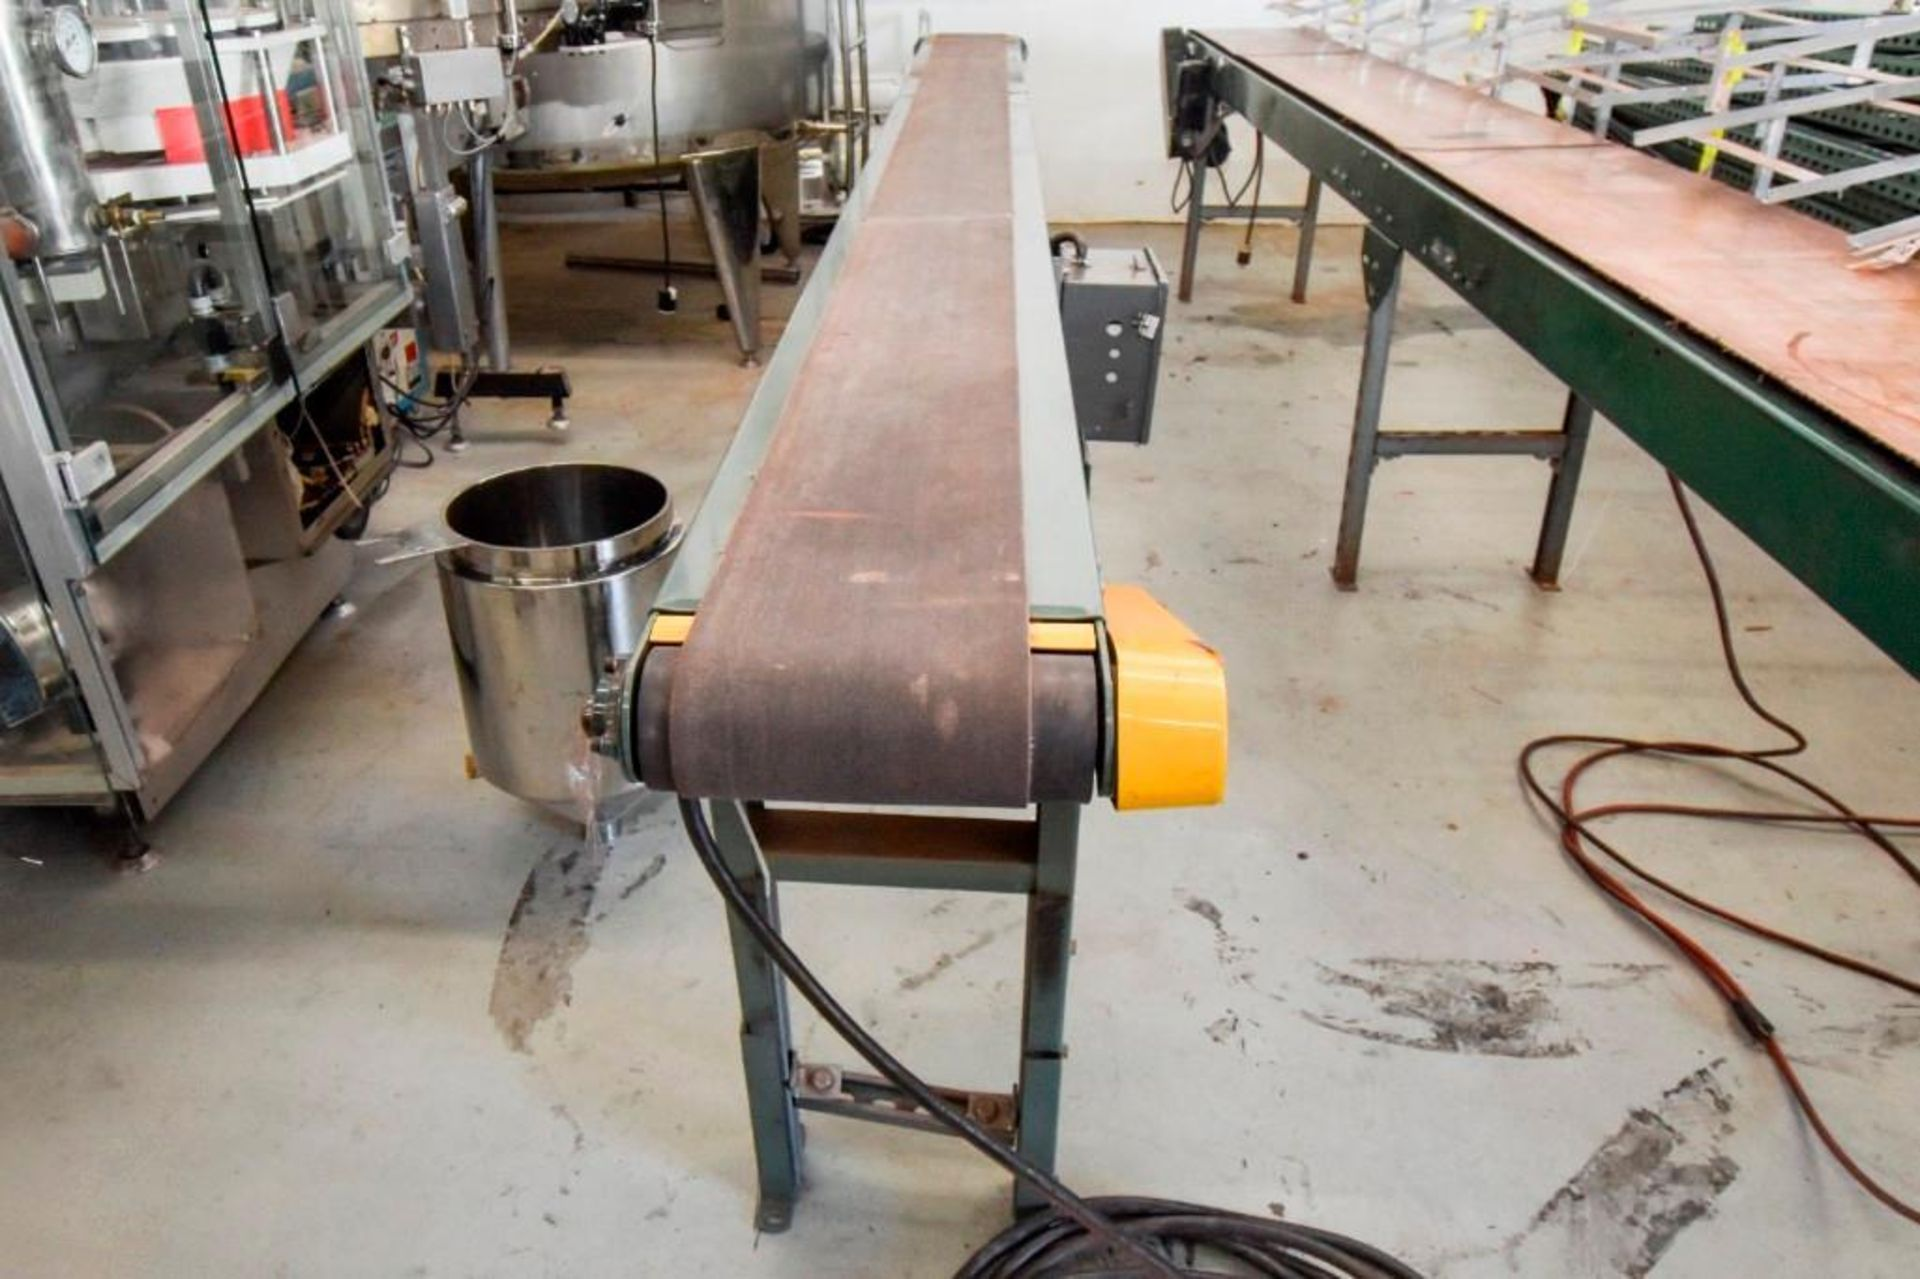 Hytrol Conveyor - Image 4 of 10